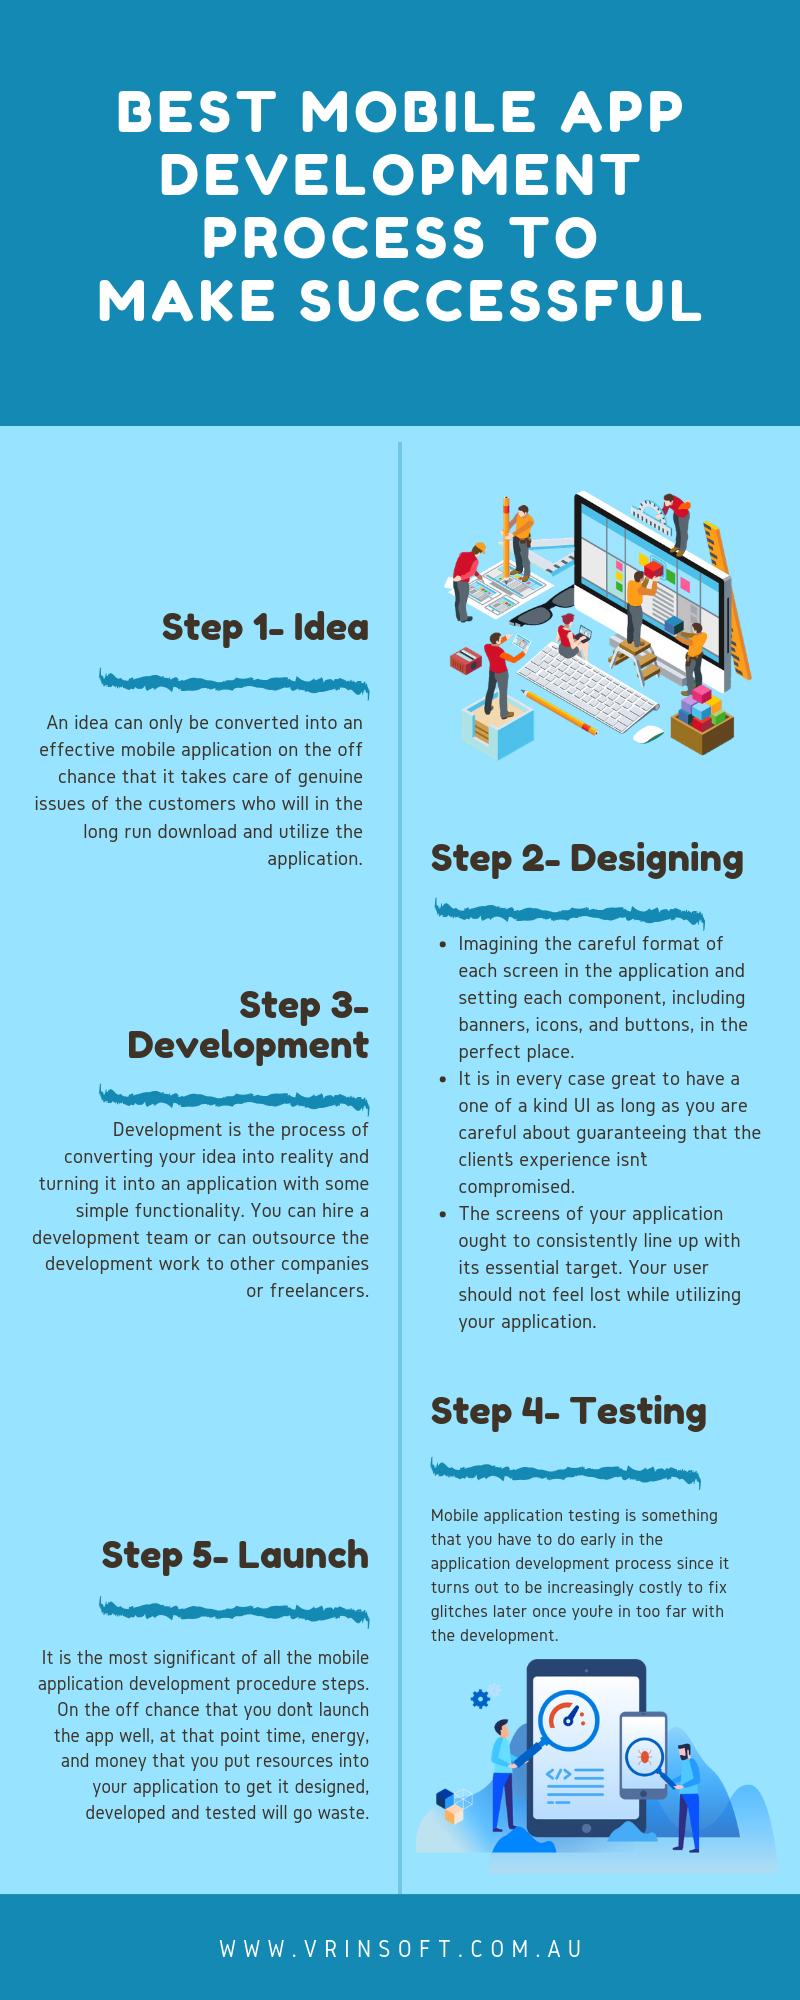 Best Mobile App Development Process to Make Successful